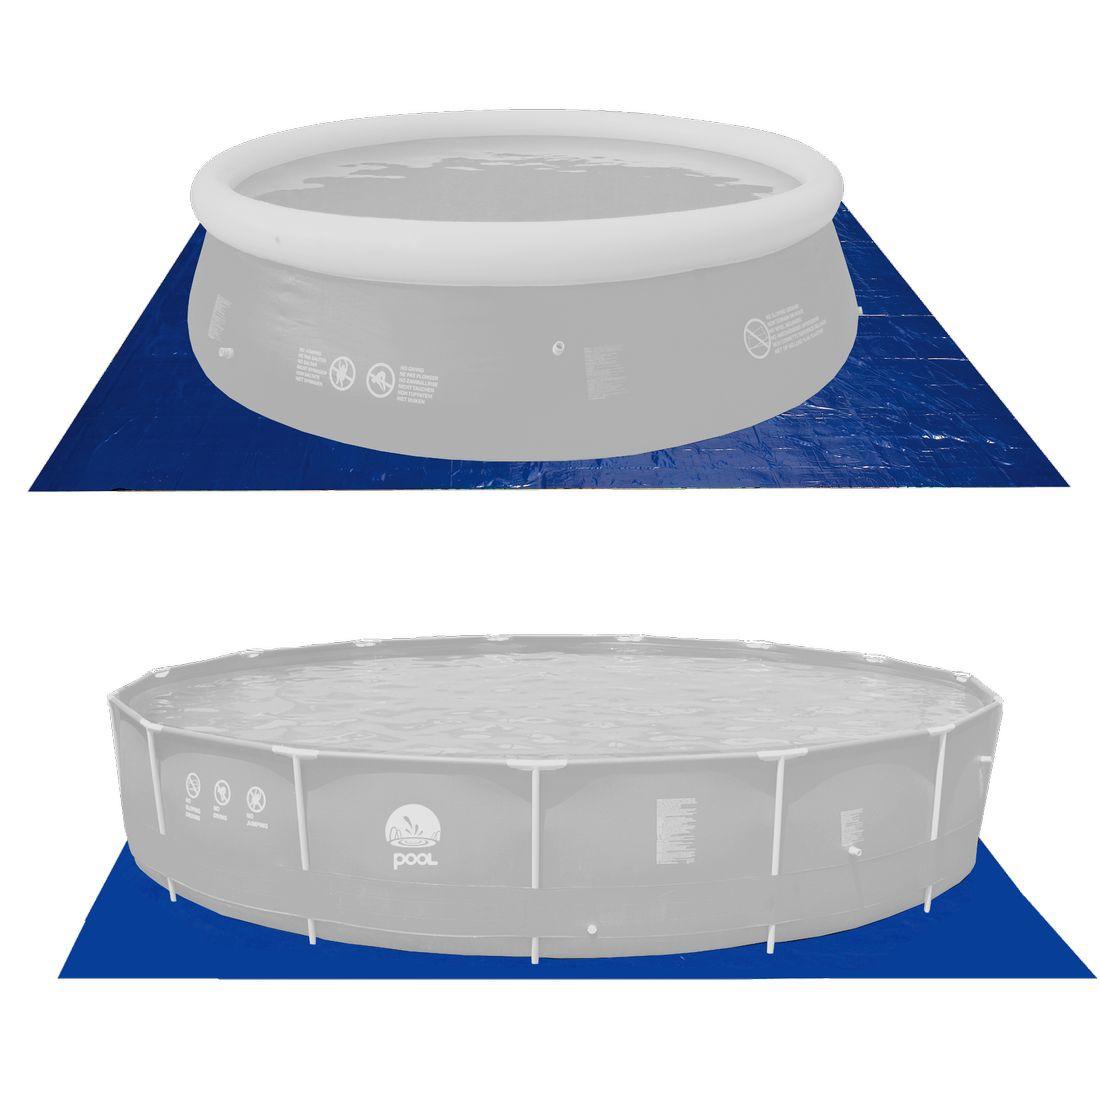 Comprare jilong gc 330x330 telo di fondo per piscine - Piscine da comprare ...